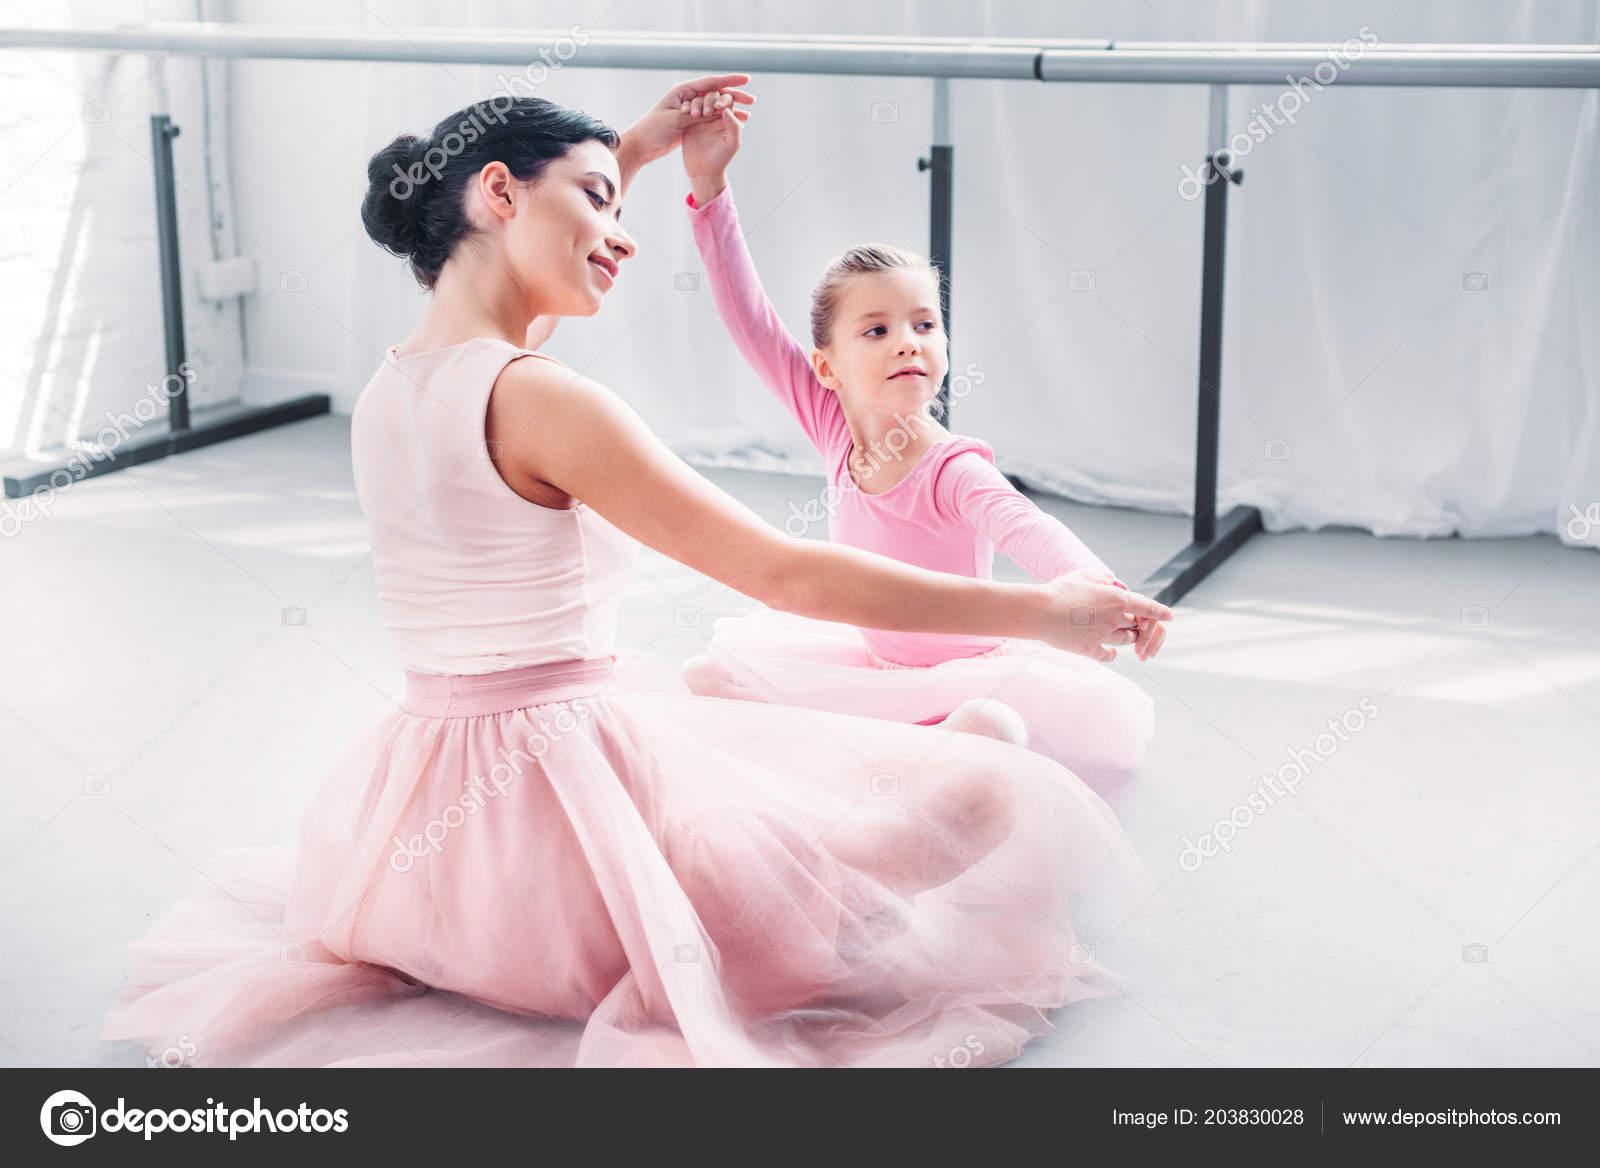 dff5cad1f61 Χαμογελαστός Νεαρός Μπαλέτο Δάσκαλος Και Μικρό Μαθητή Ροζ Τουτού Φούστες — Φωτογραφία  Αρχείου